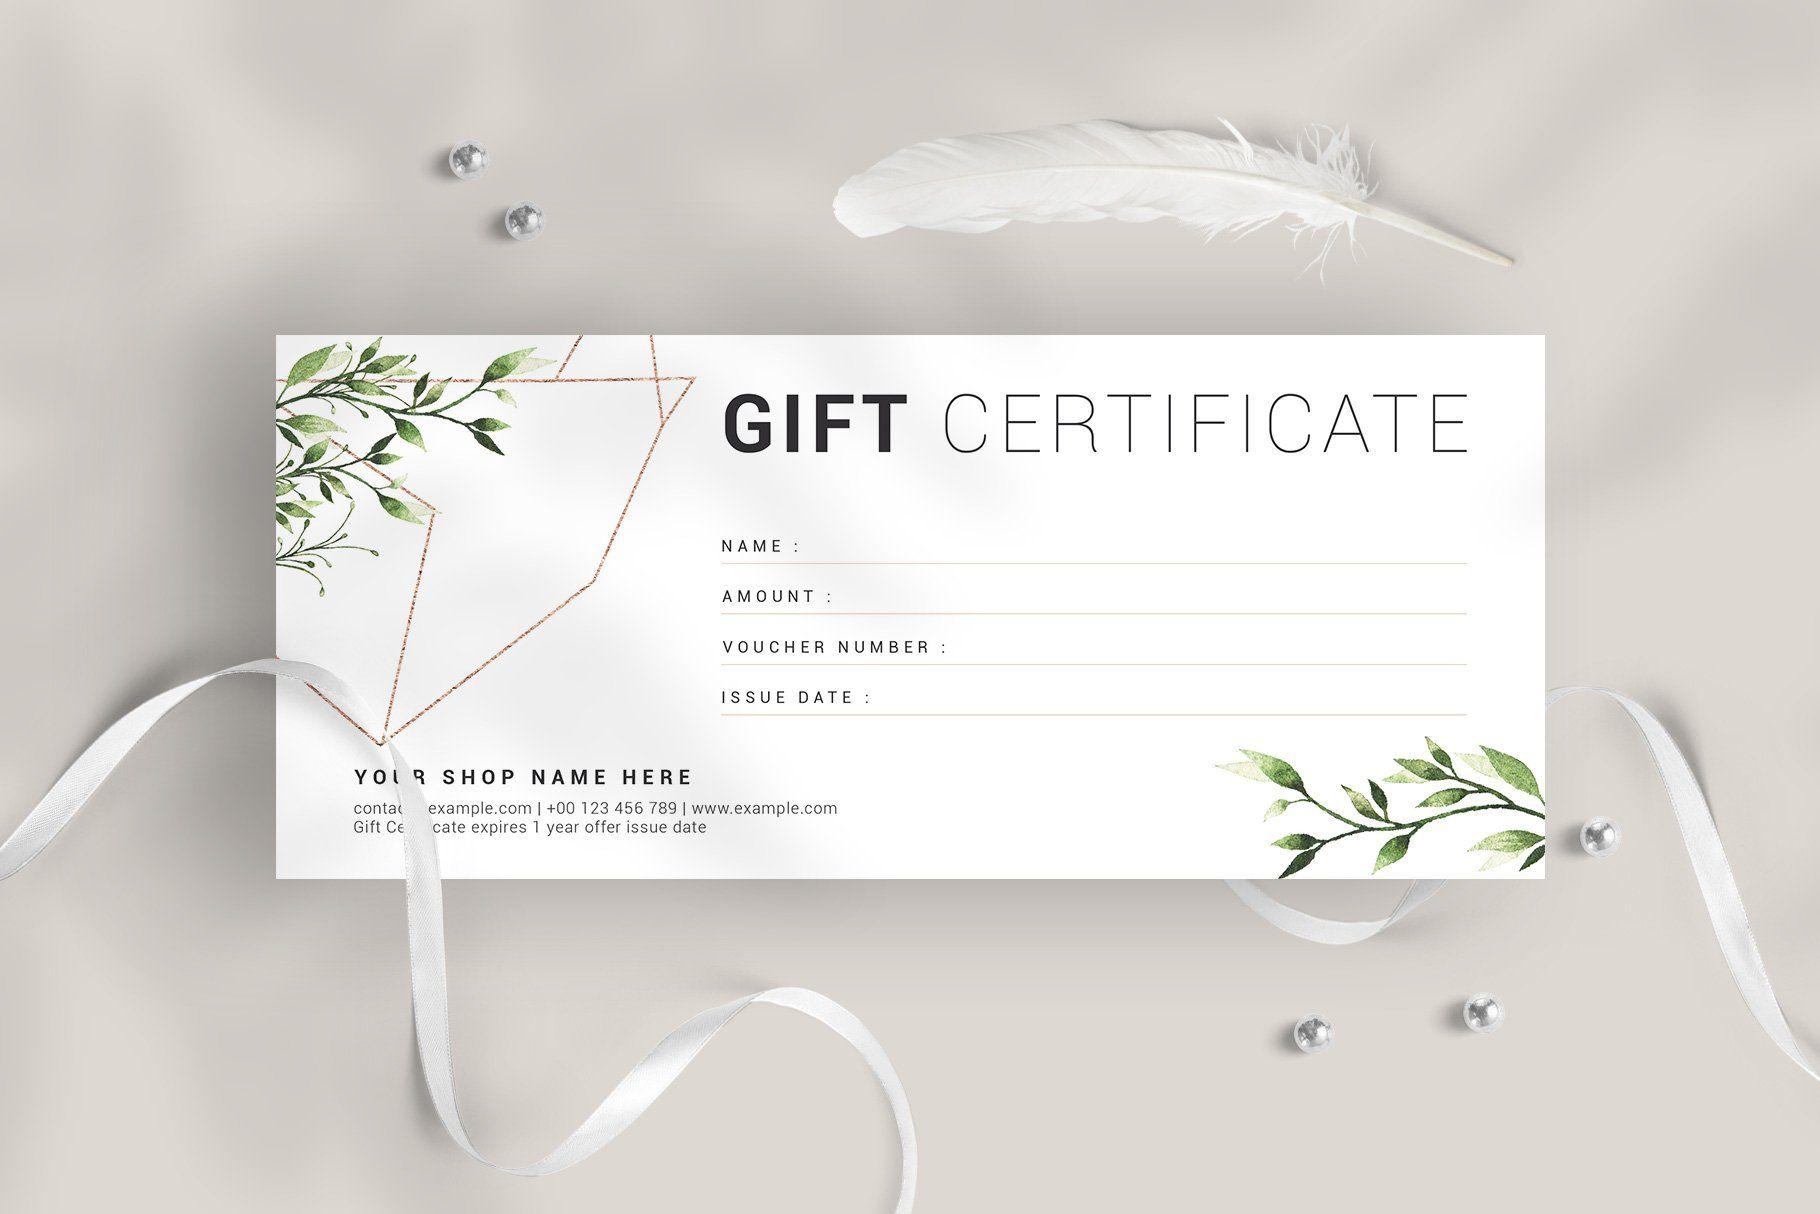 Gift Certificate Gift Voucher Design Voucher Design Gift Certificate Template